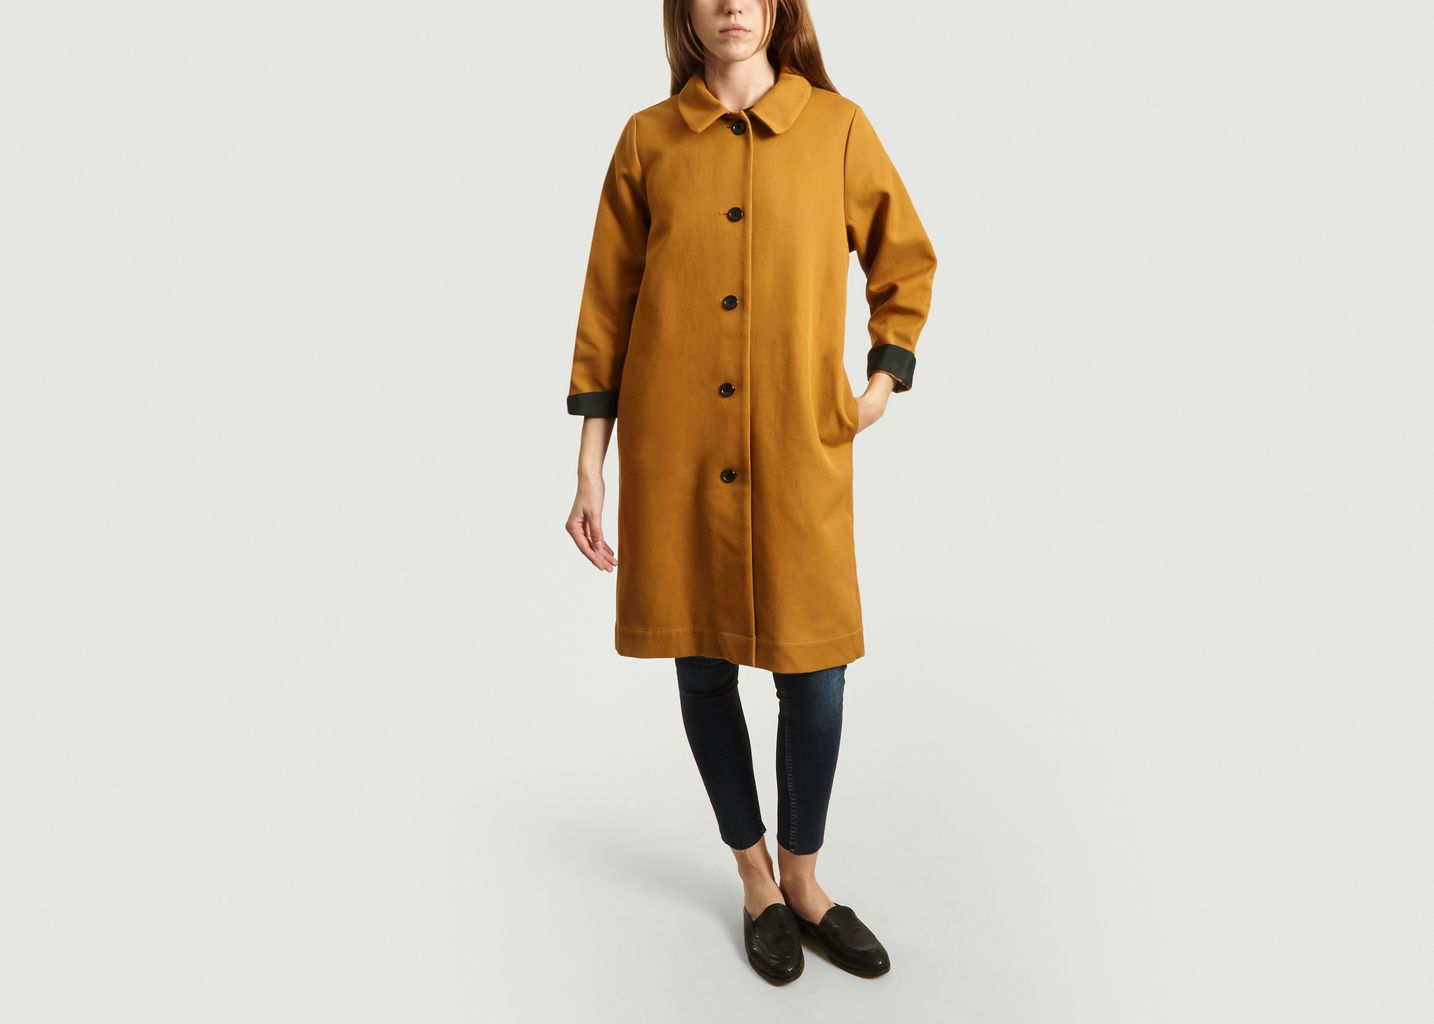 Manteau En Coton Ladji - Bellerose